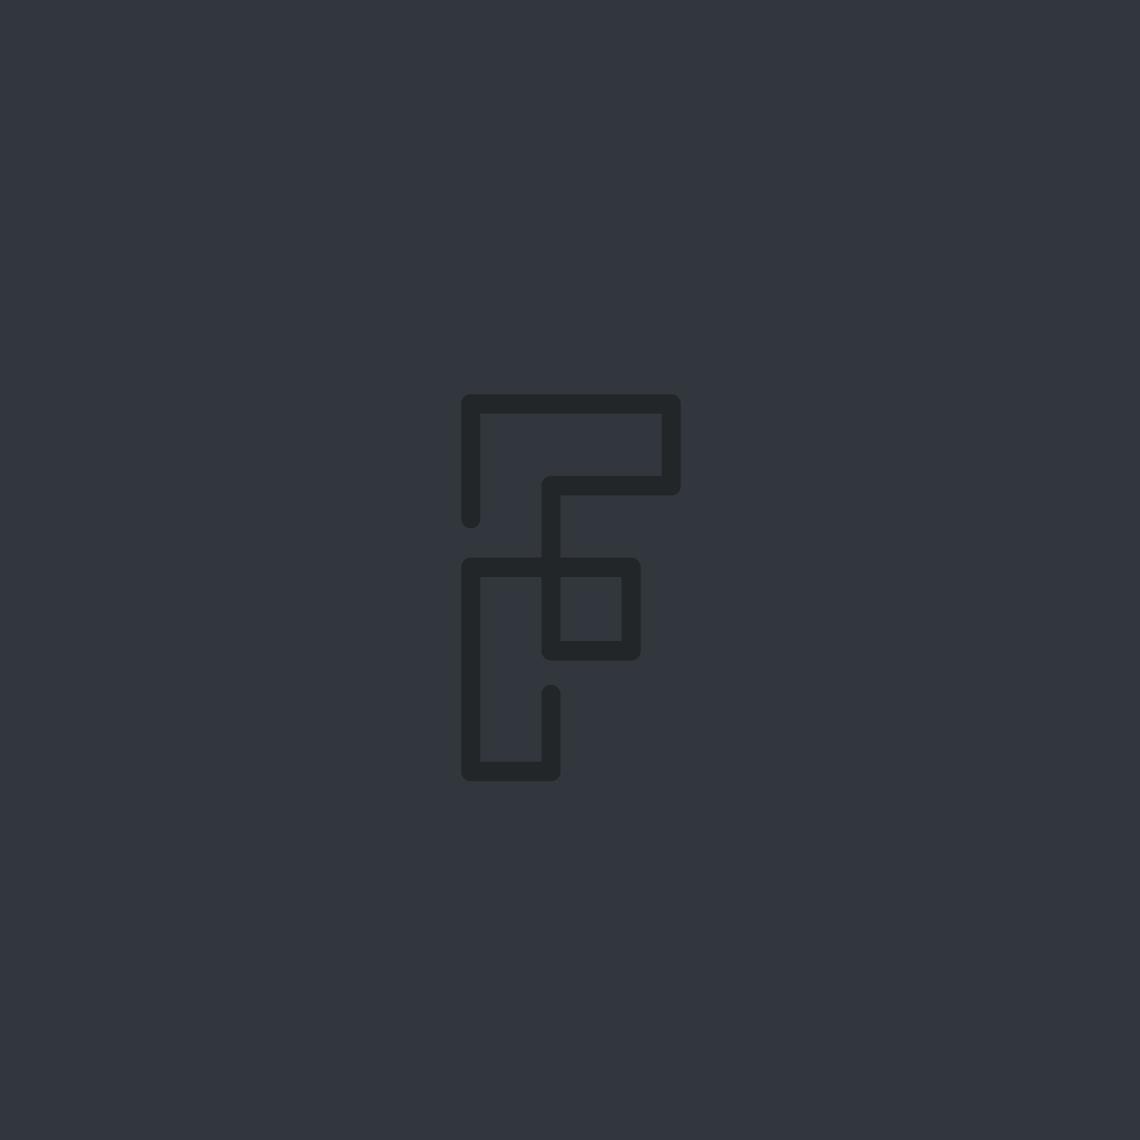 rayko_fluent_card_02